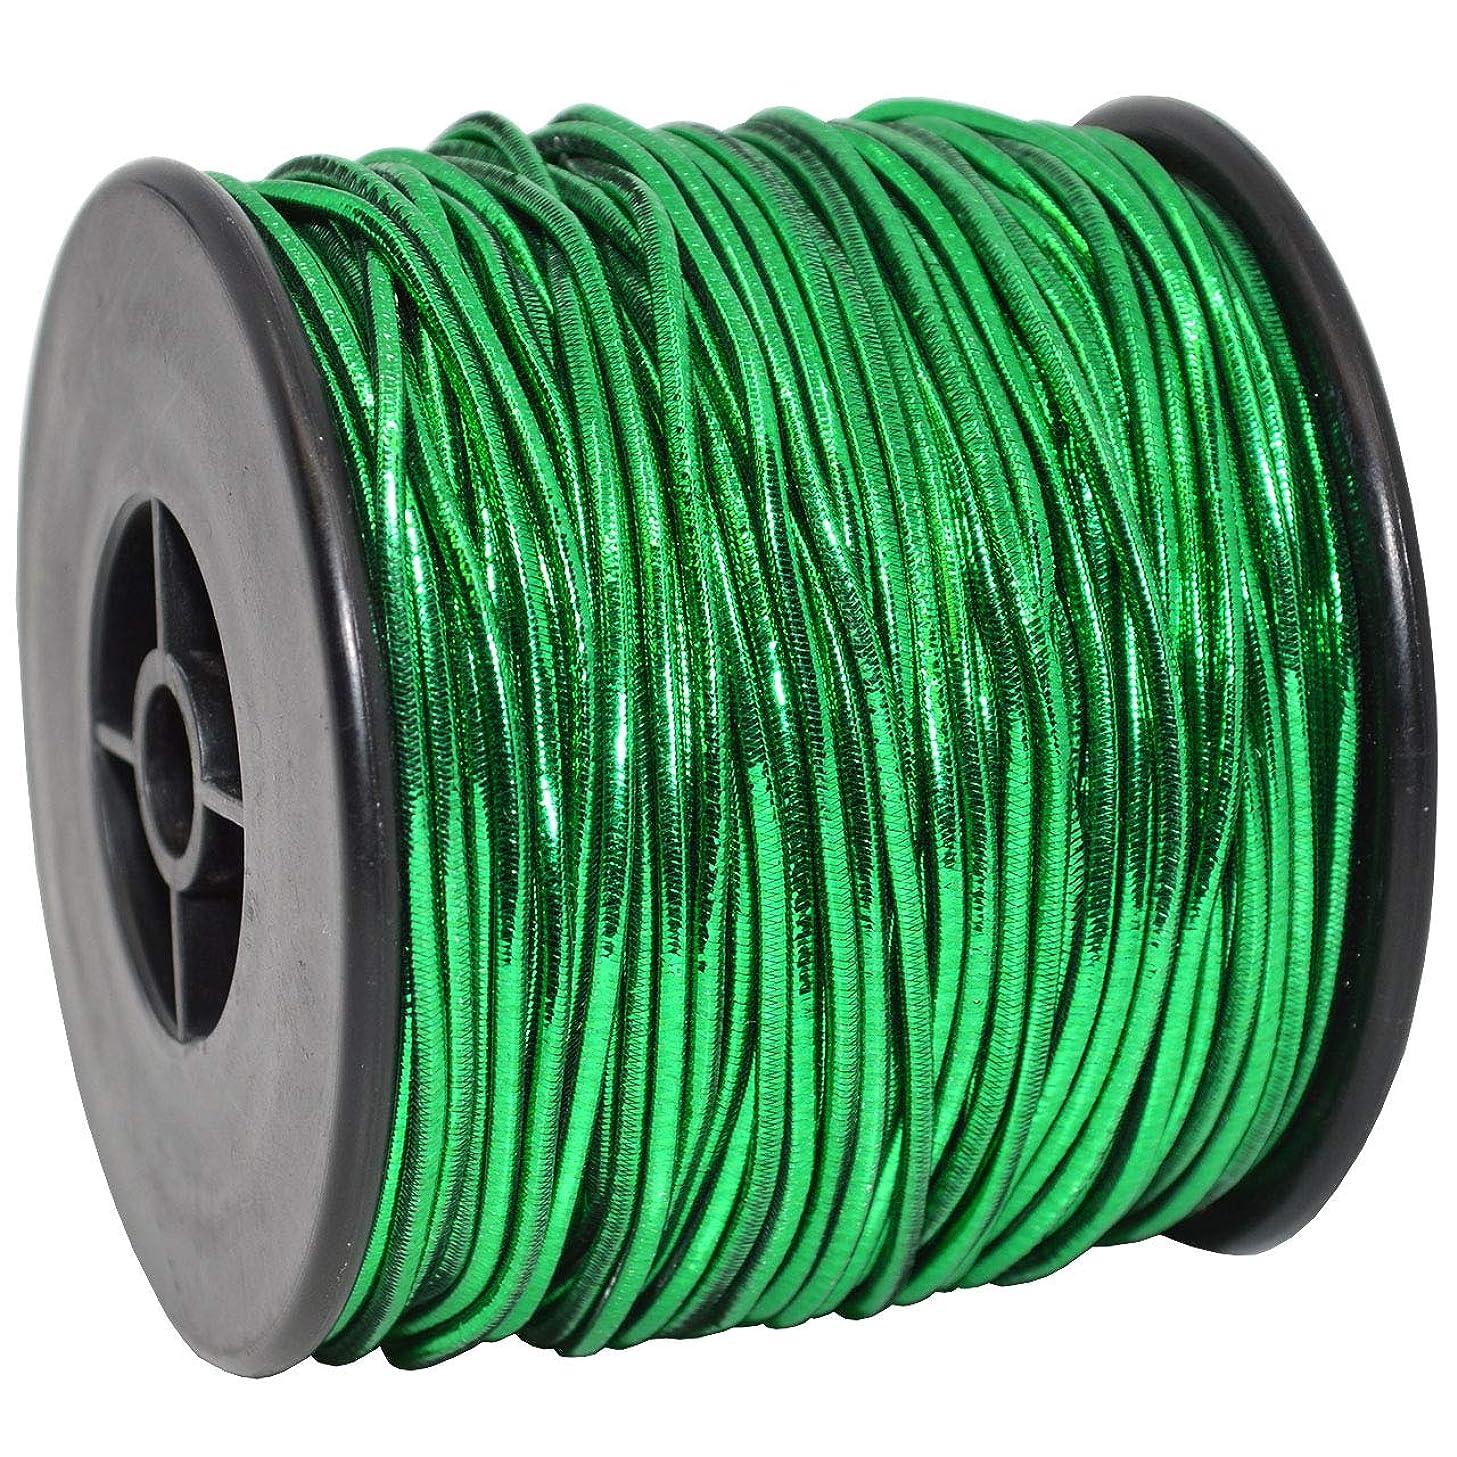 Morex Ribbon 1318 Elastic Stretch Cord Ribbon, 1/16 inch by 50 Yards, Green